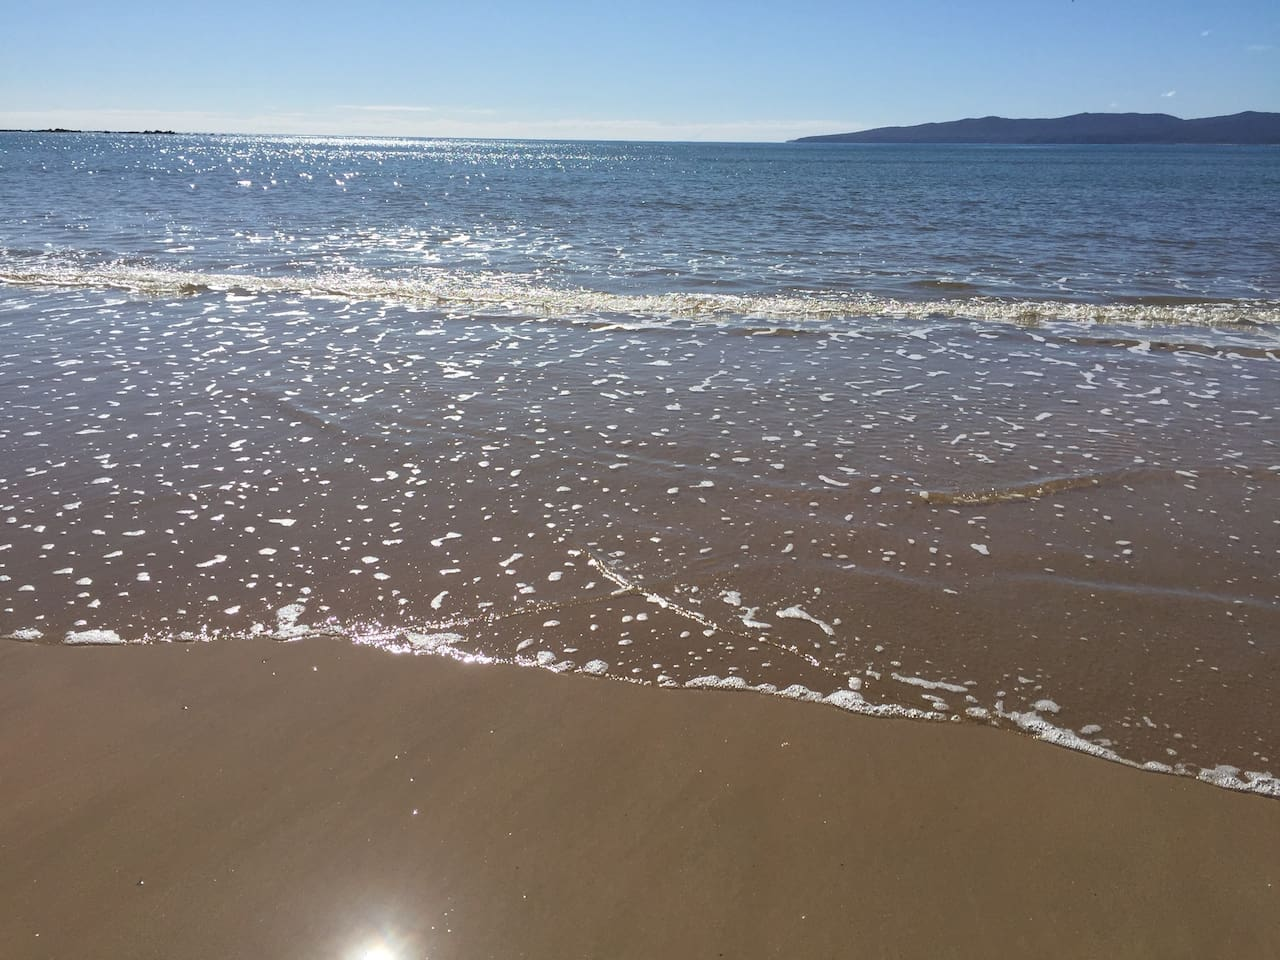 Inward tide.